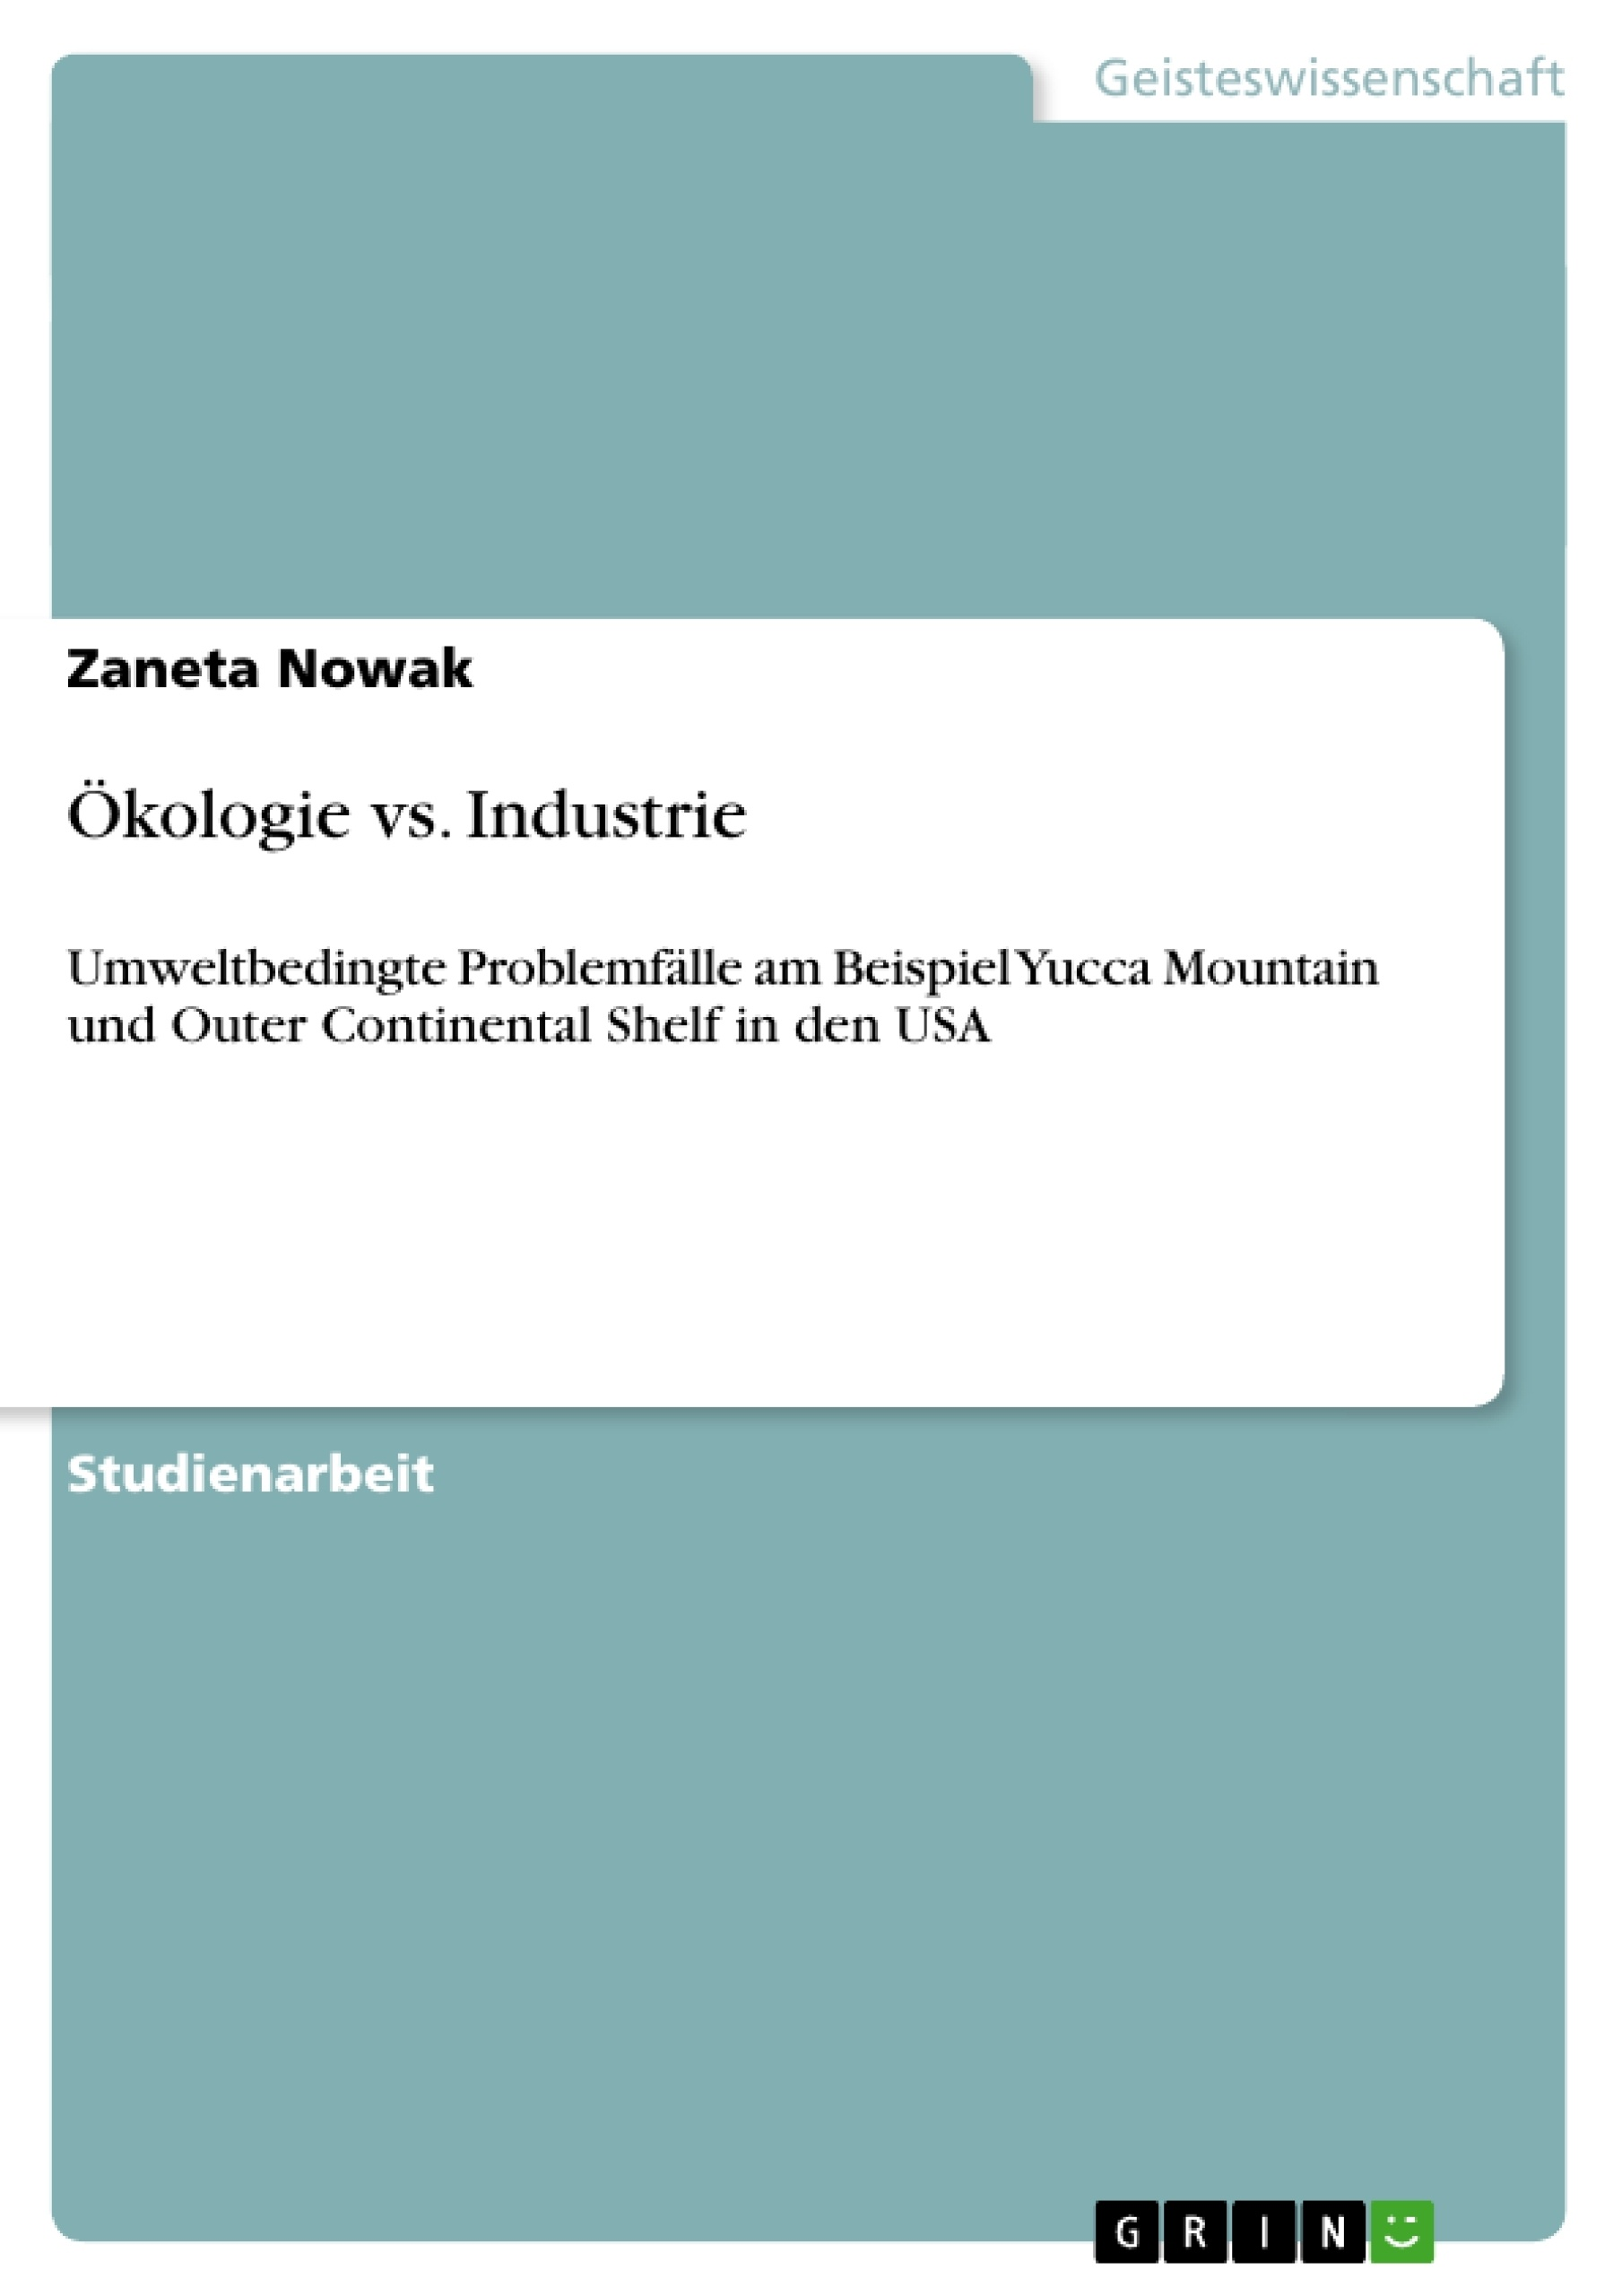 Titel: Ökologie vs. Industrie